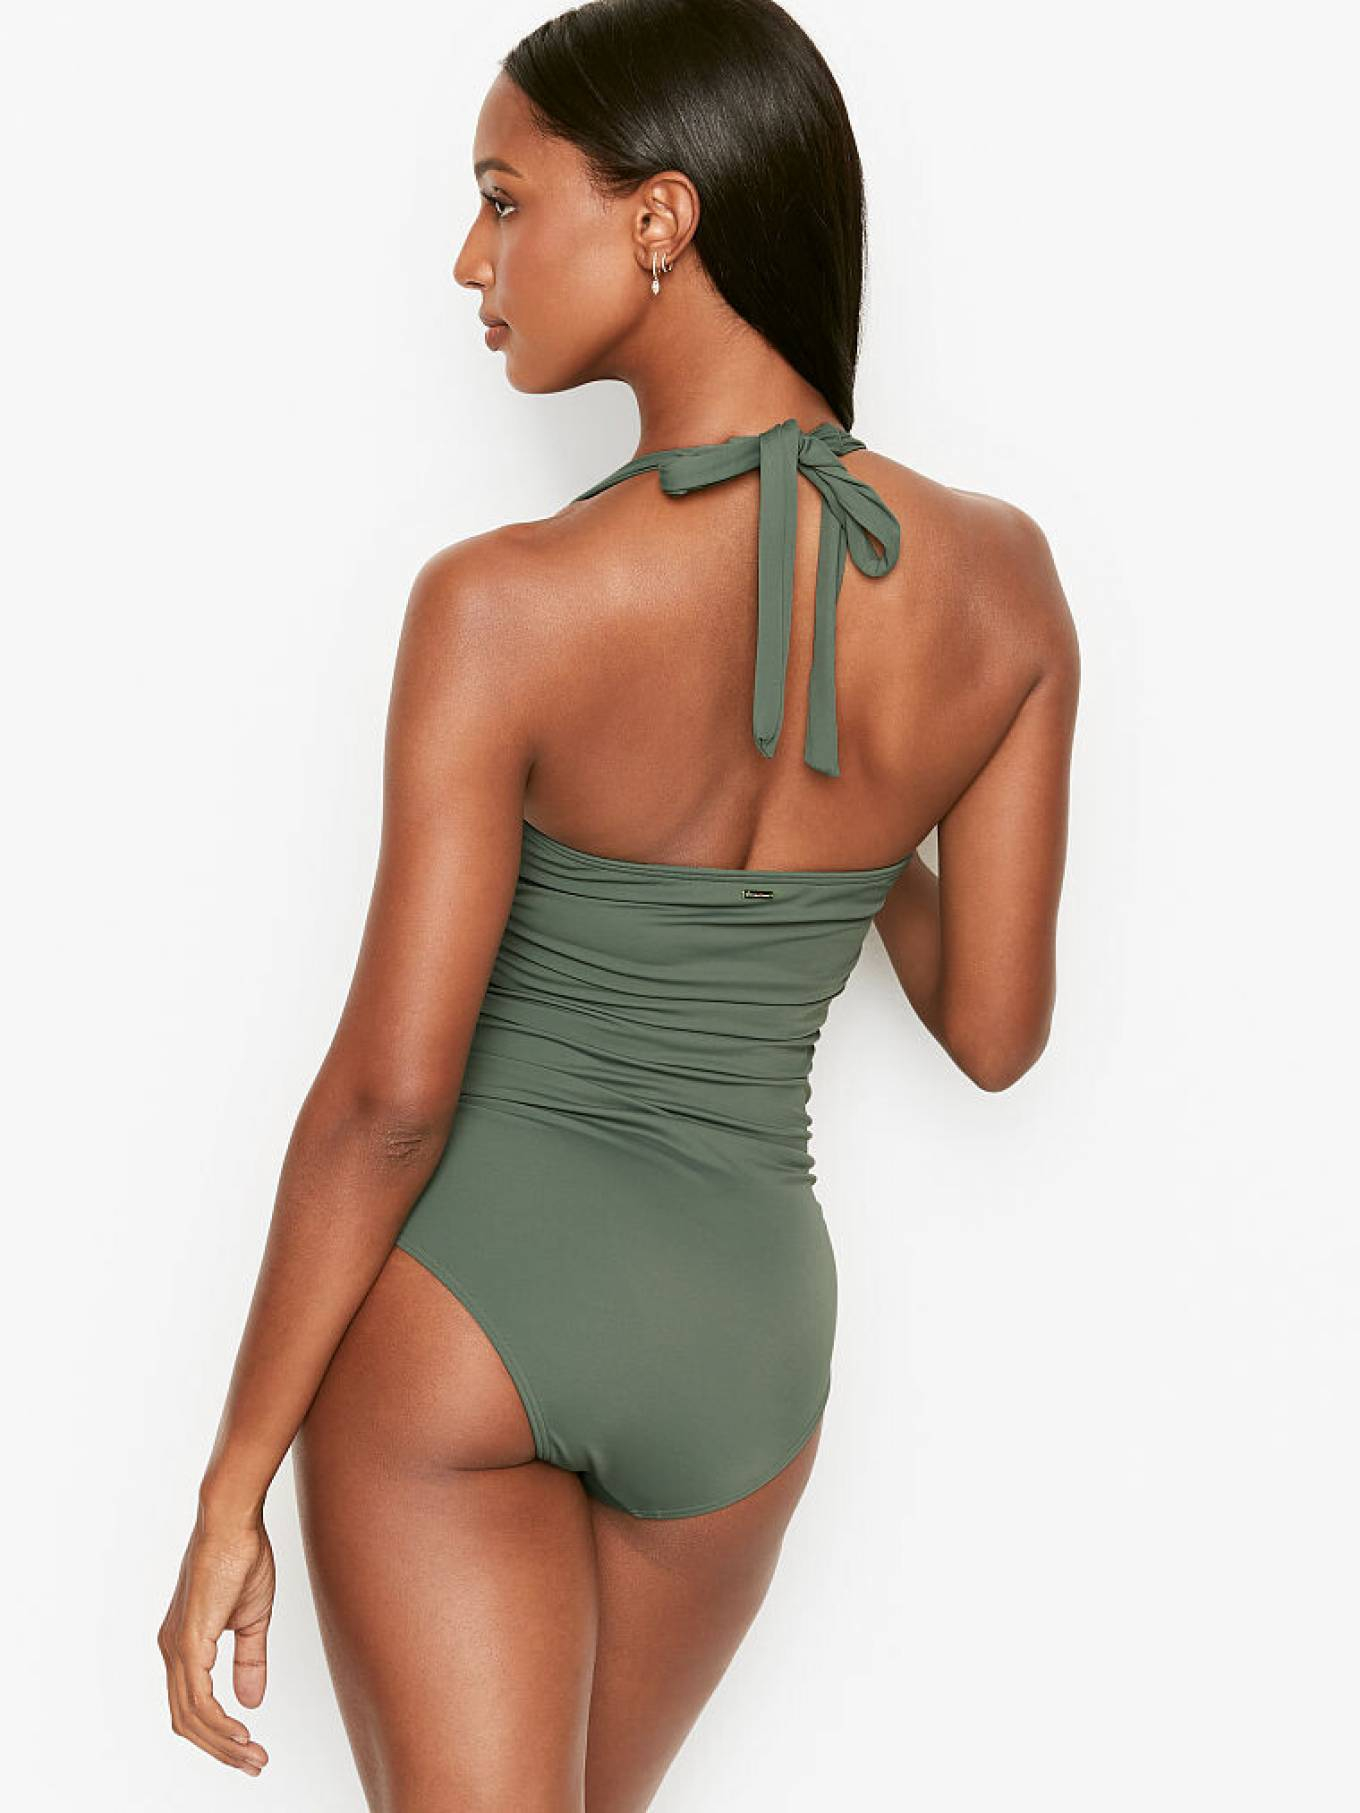 Jasmine Tookes 2020 : Jasmine Tookes – Victorias Secret collection – November 2020-06